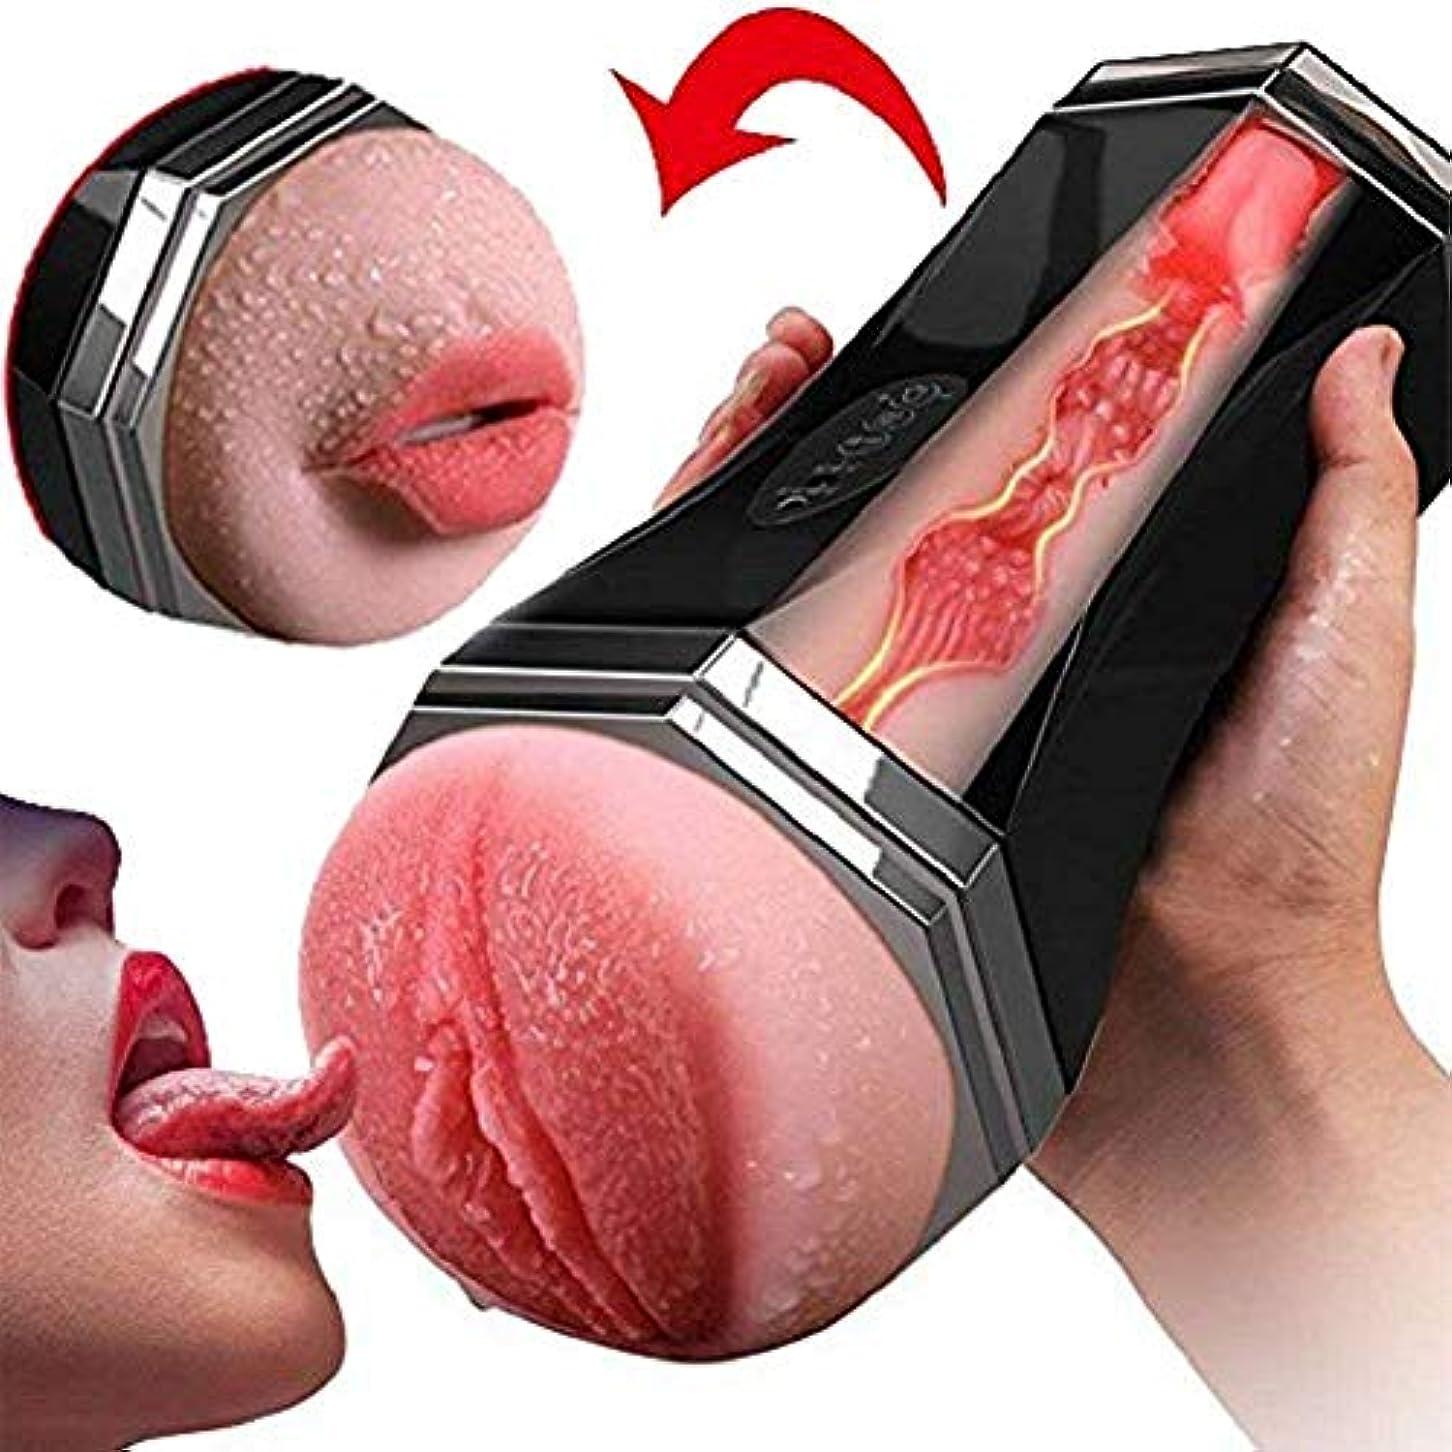 ZMhouse実用的 口頭自動コップの振動の吸うマッサージャー、多モードTシャツが付いている人の電気PusseysのStrockerの袖のコップのおもちゃ ギフト